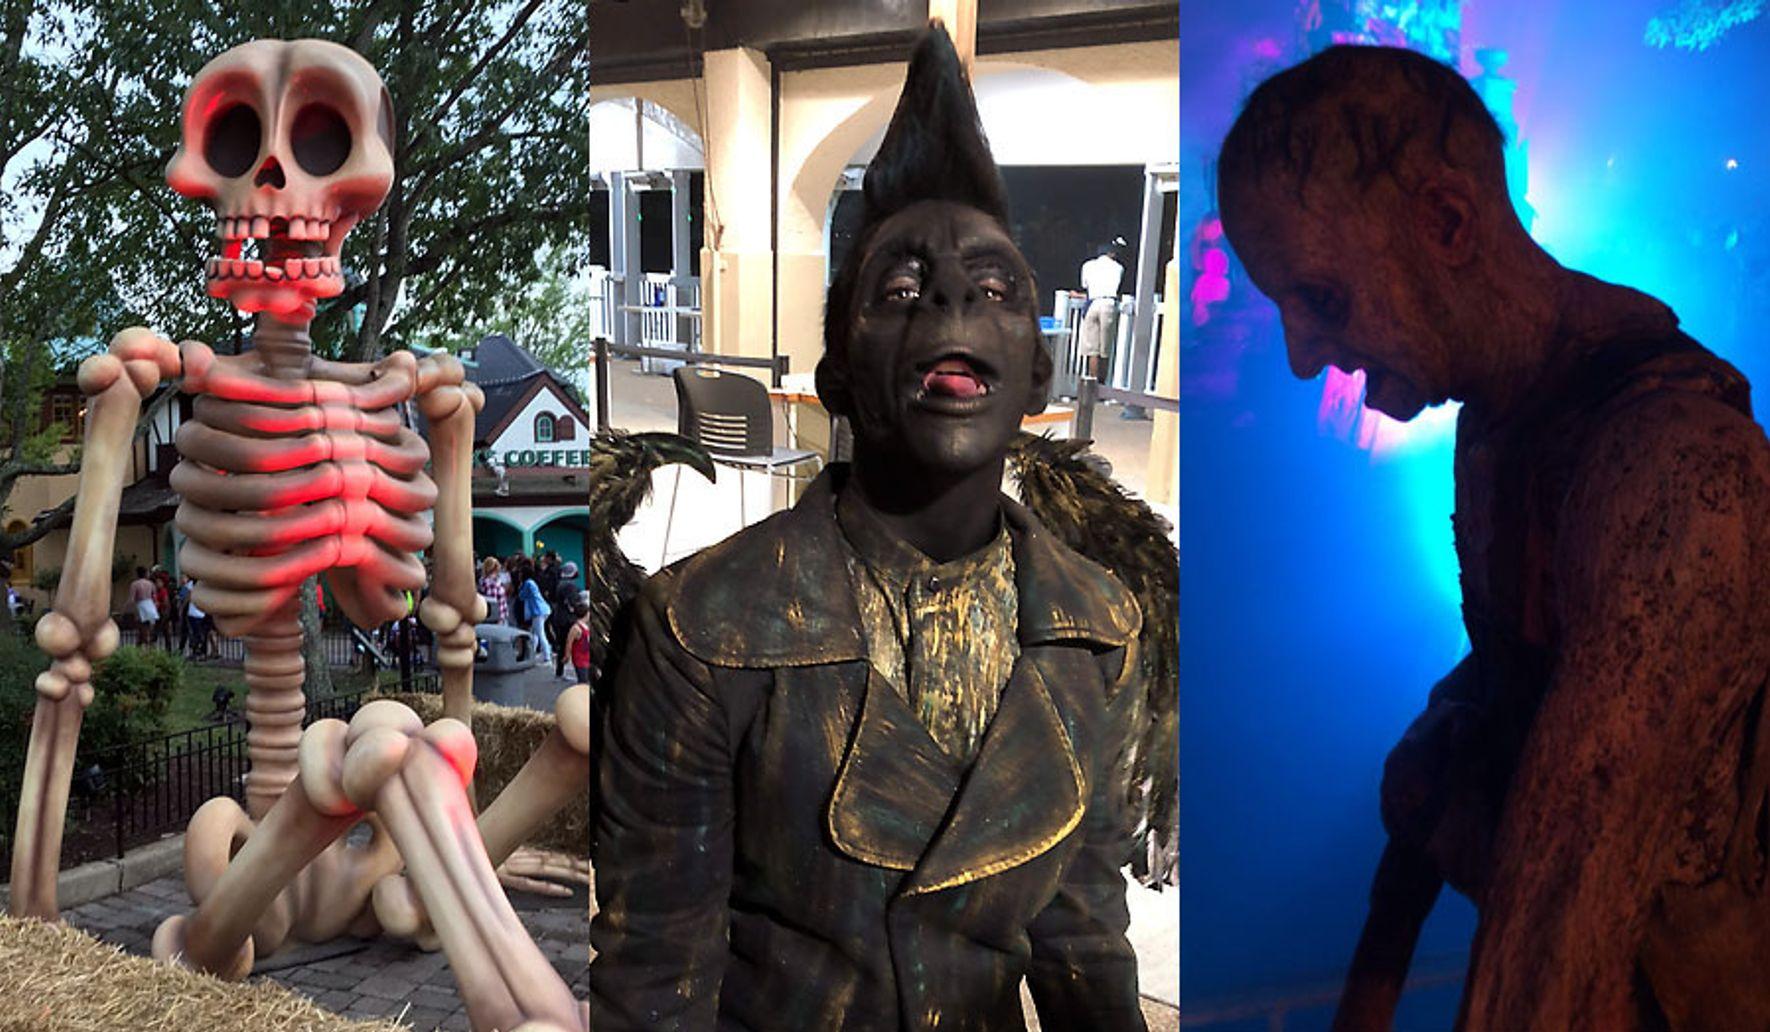 Best horror attractions 2018: Kings Dominion's 'Halloween Haunt